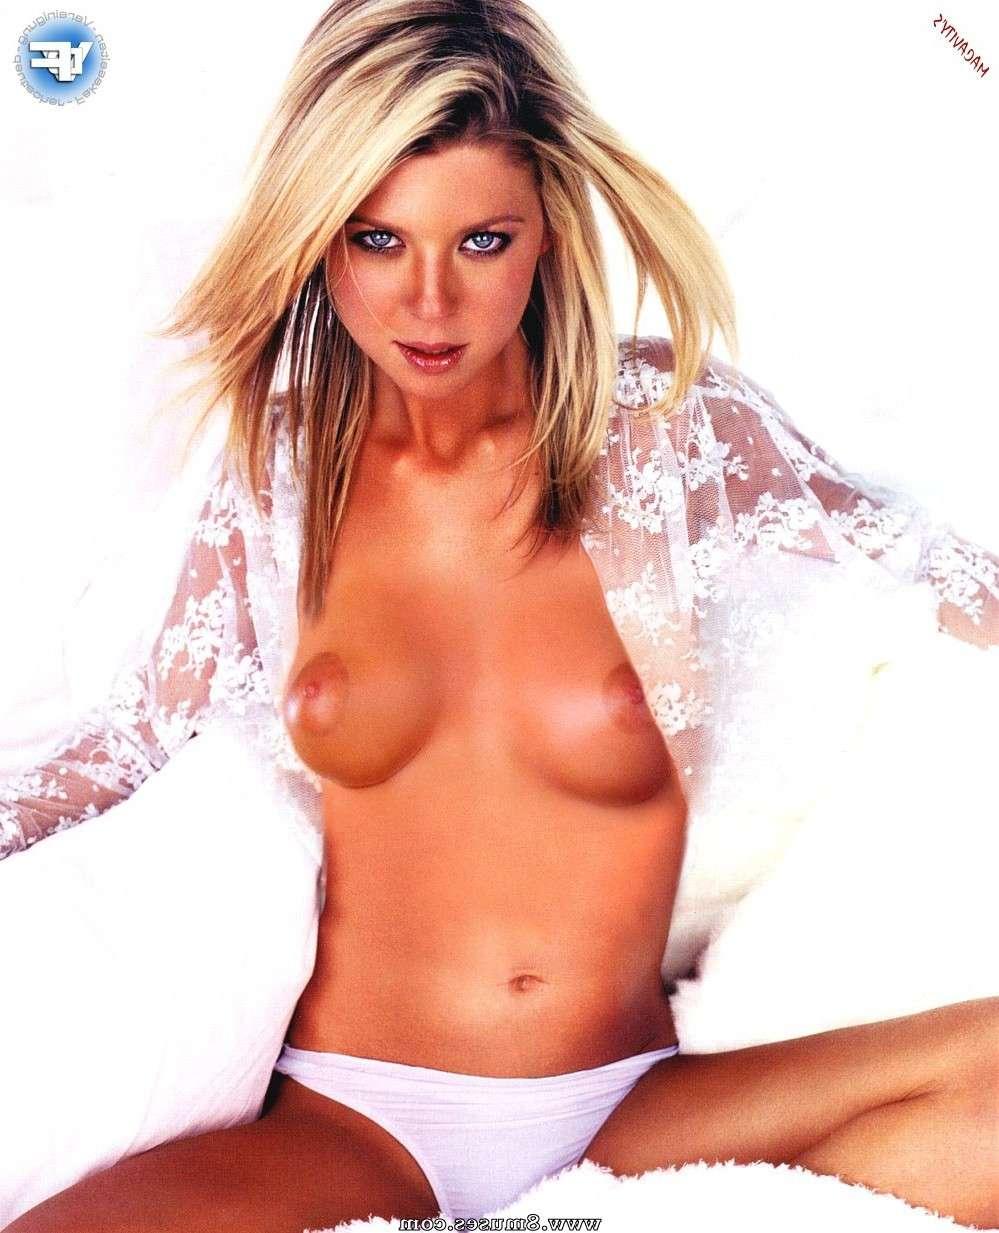 Fake-Celebrities-Sex-Pictures/Tara-Reid Tara_Reid__8muses_-_Sex_and_Porn_Comics_114.jpg